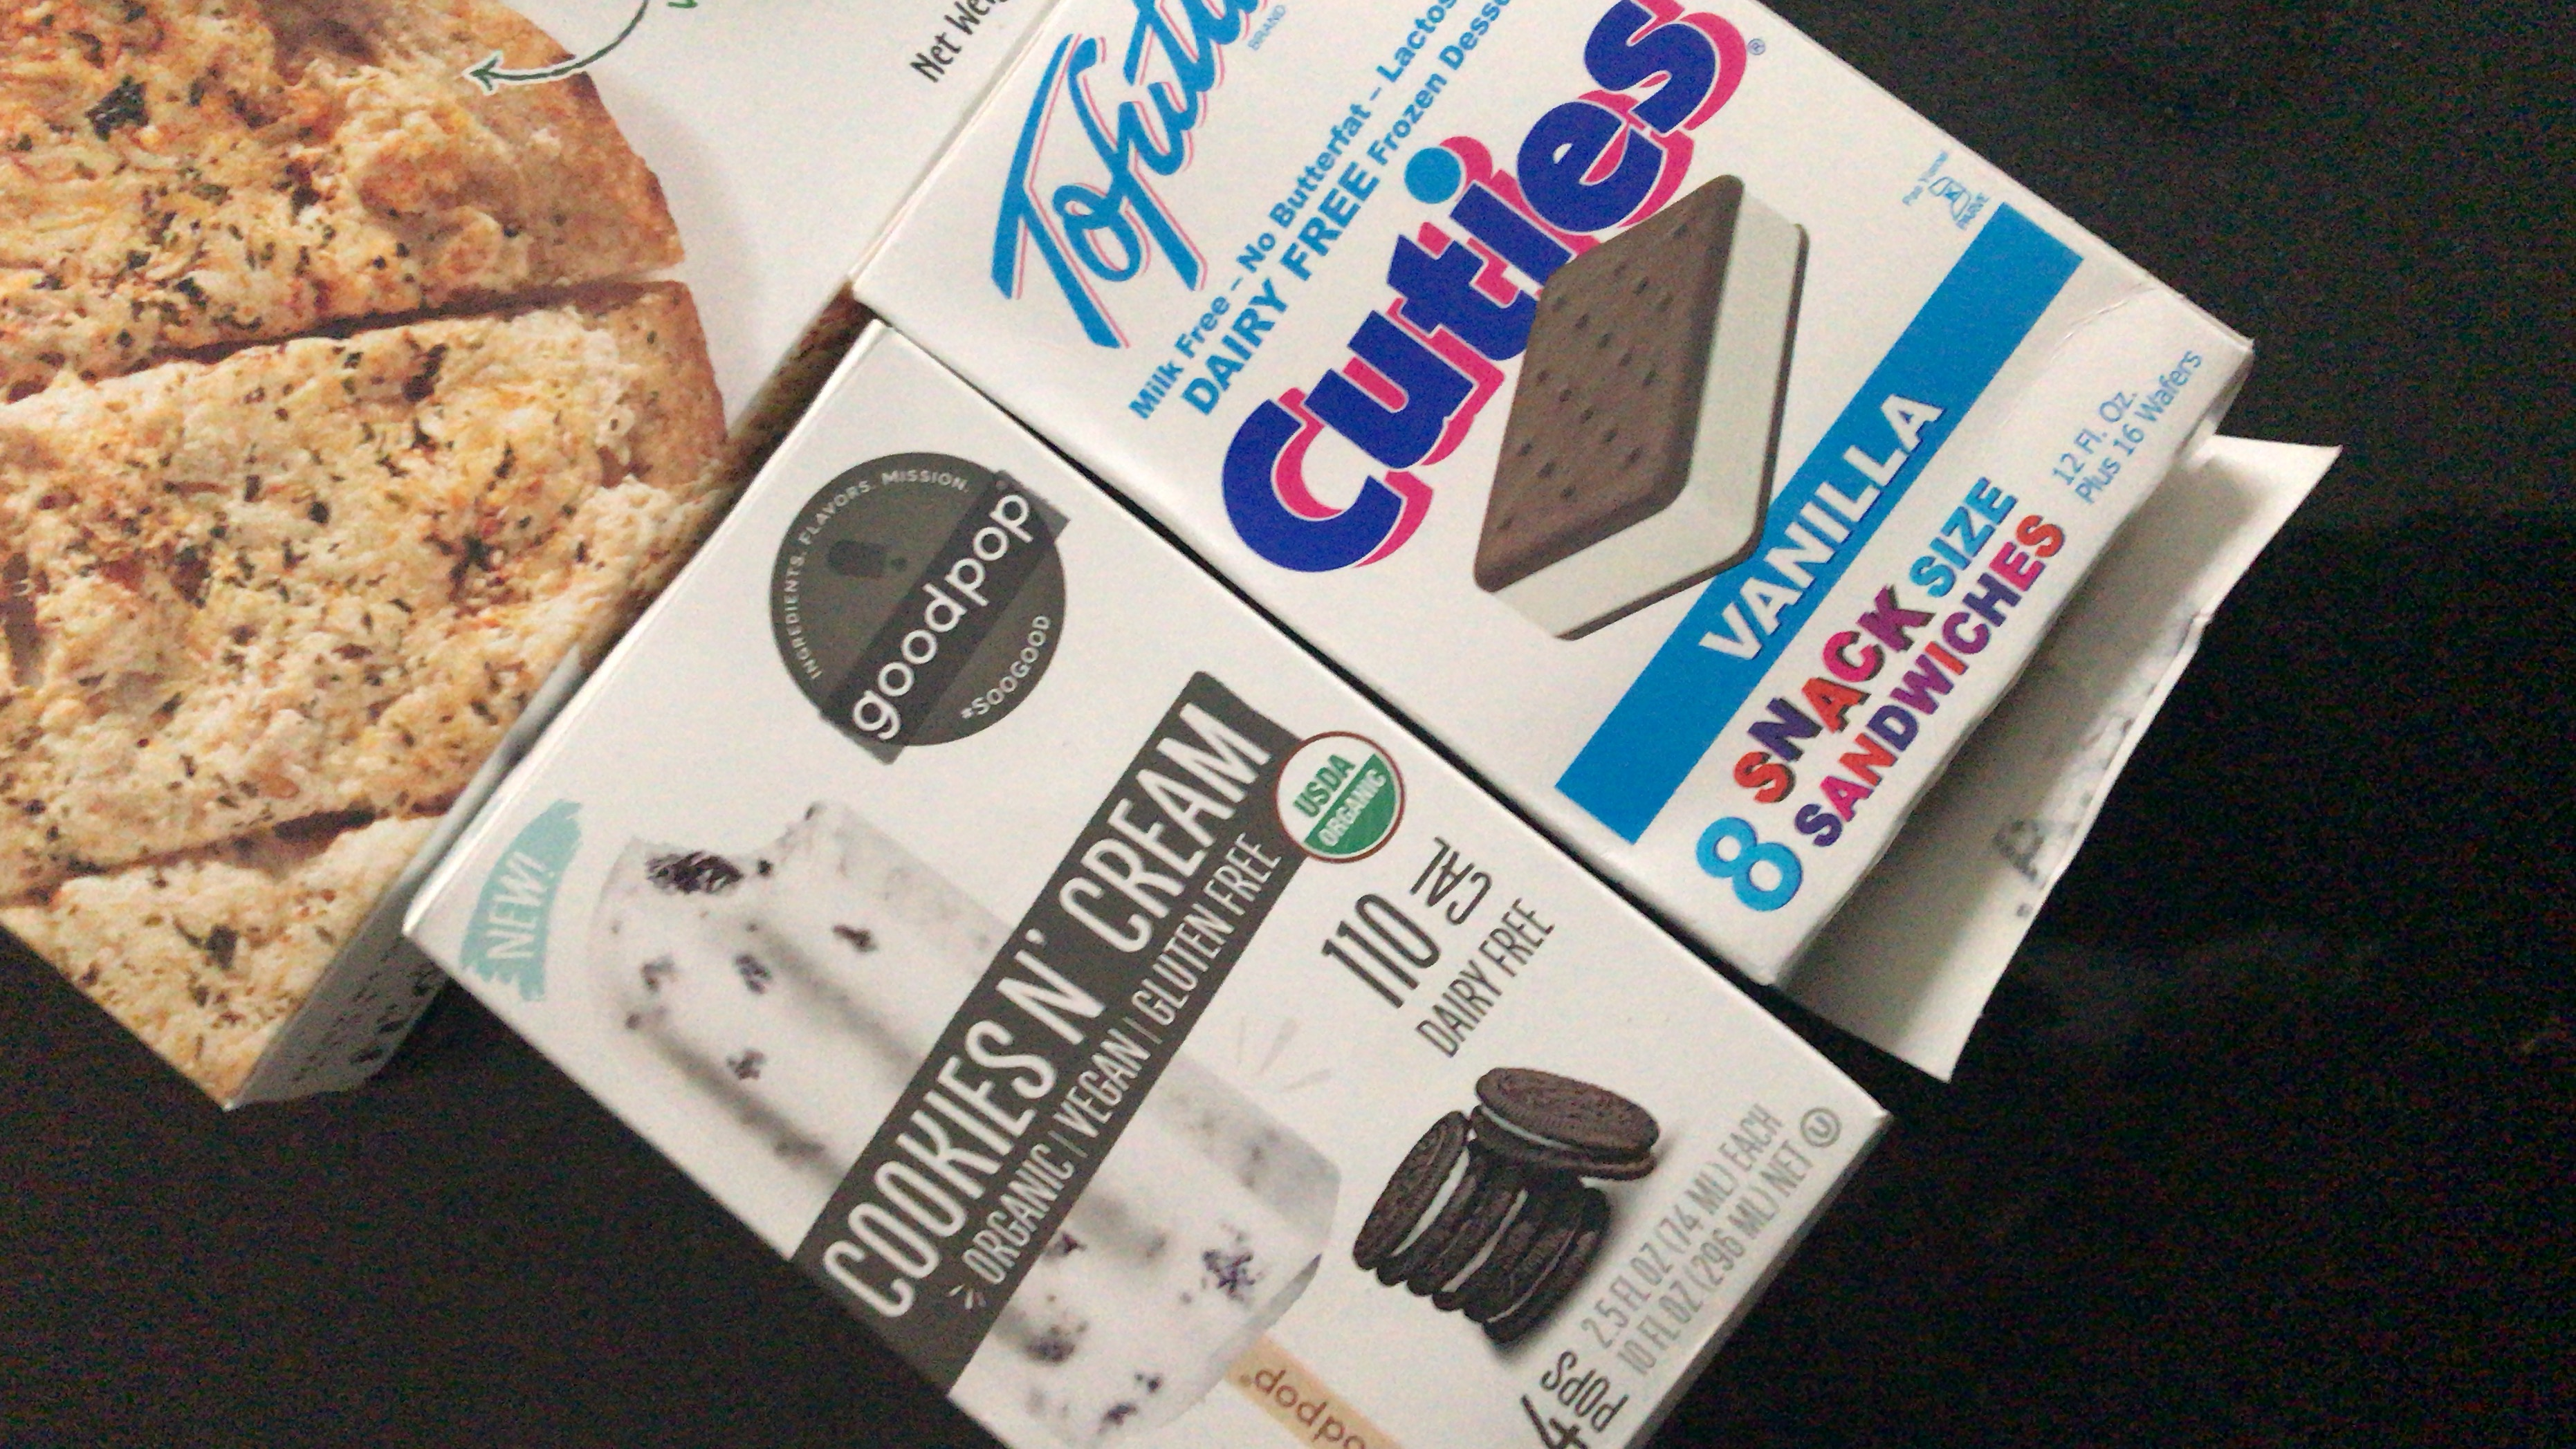 Tofutti Frozen Dessert Dairy Free Vanilla Snack Size Sanwiches - 8 CT uploaded by Isadora N.